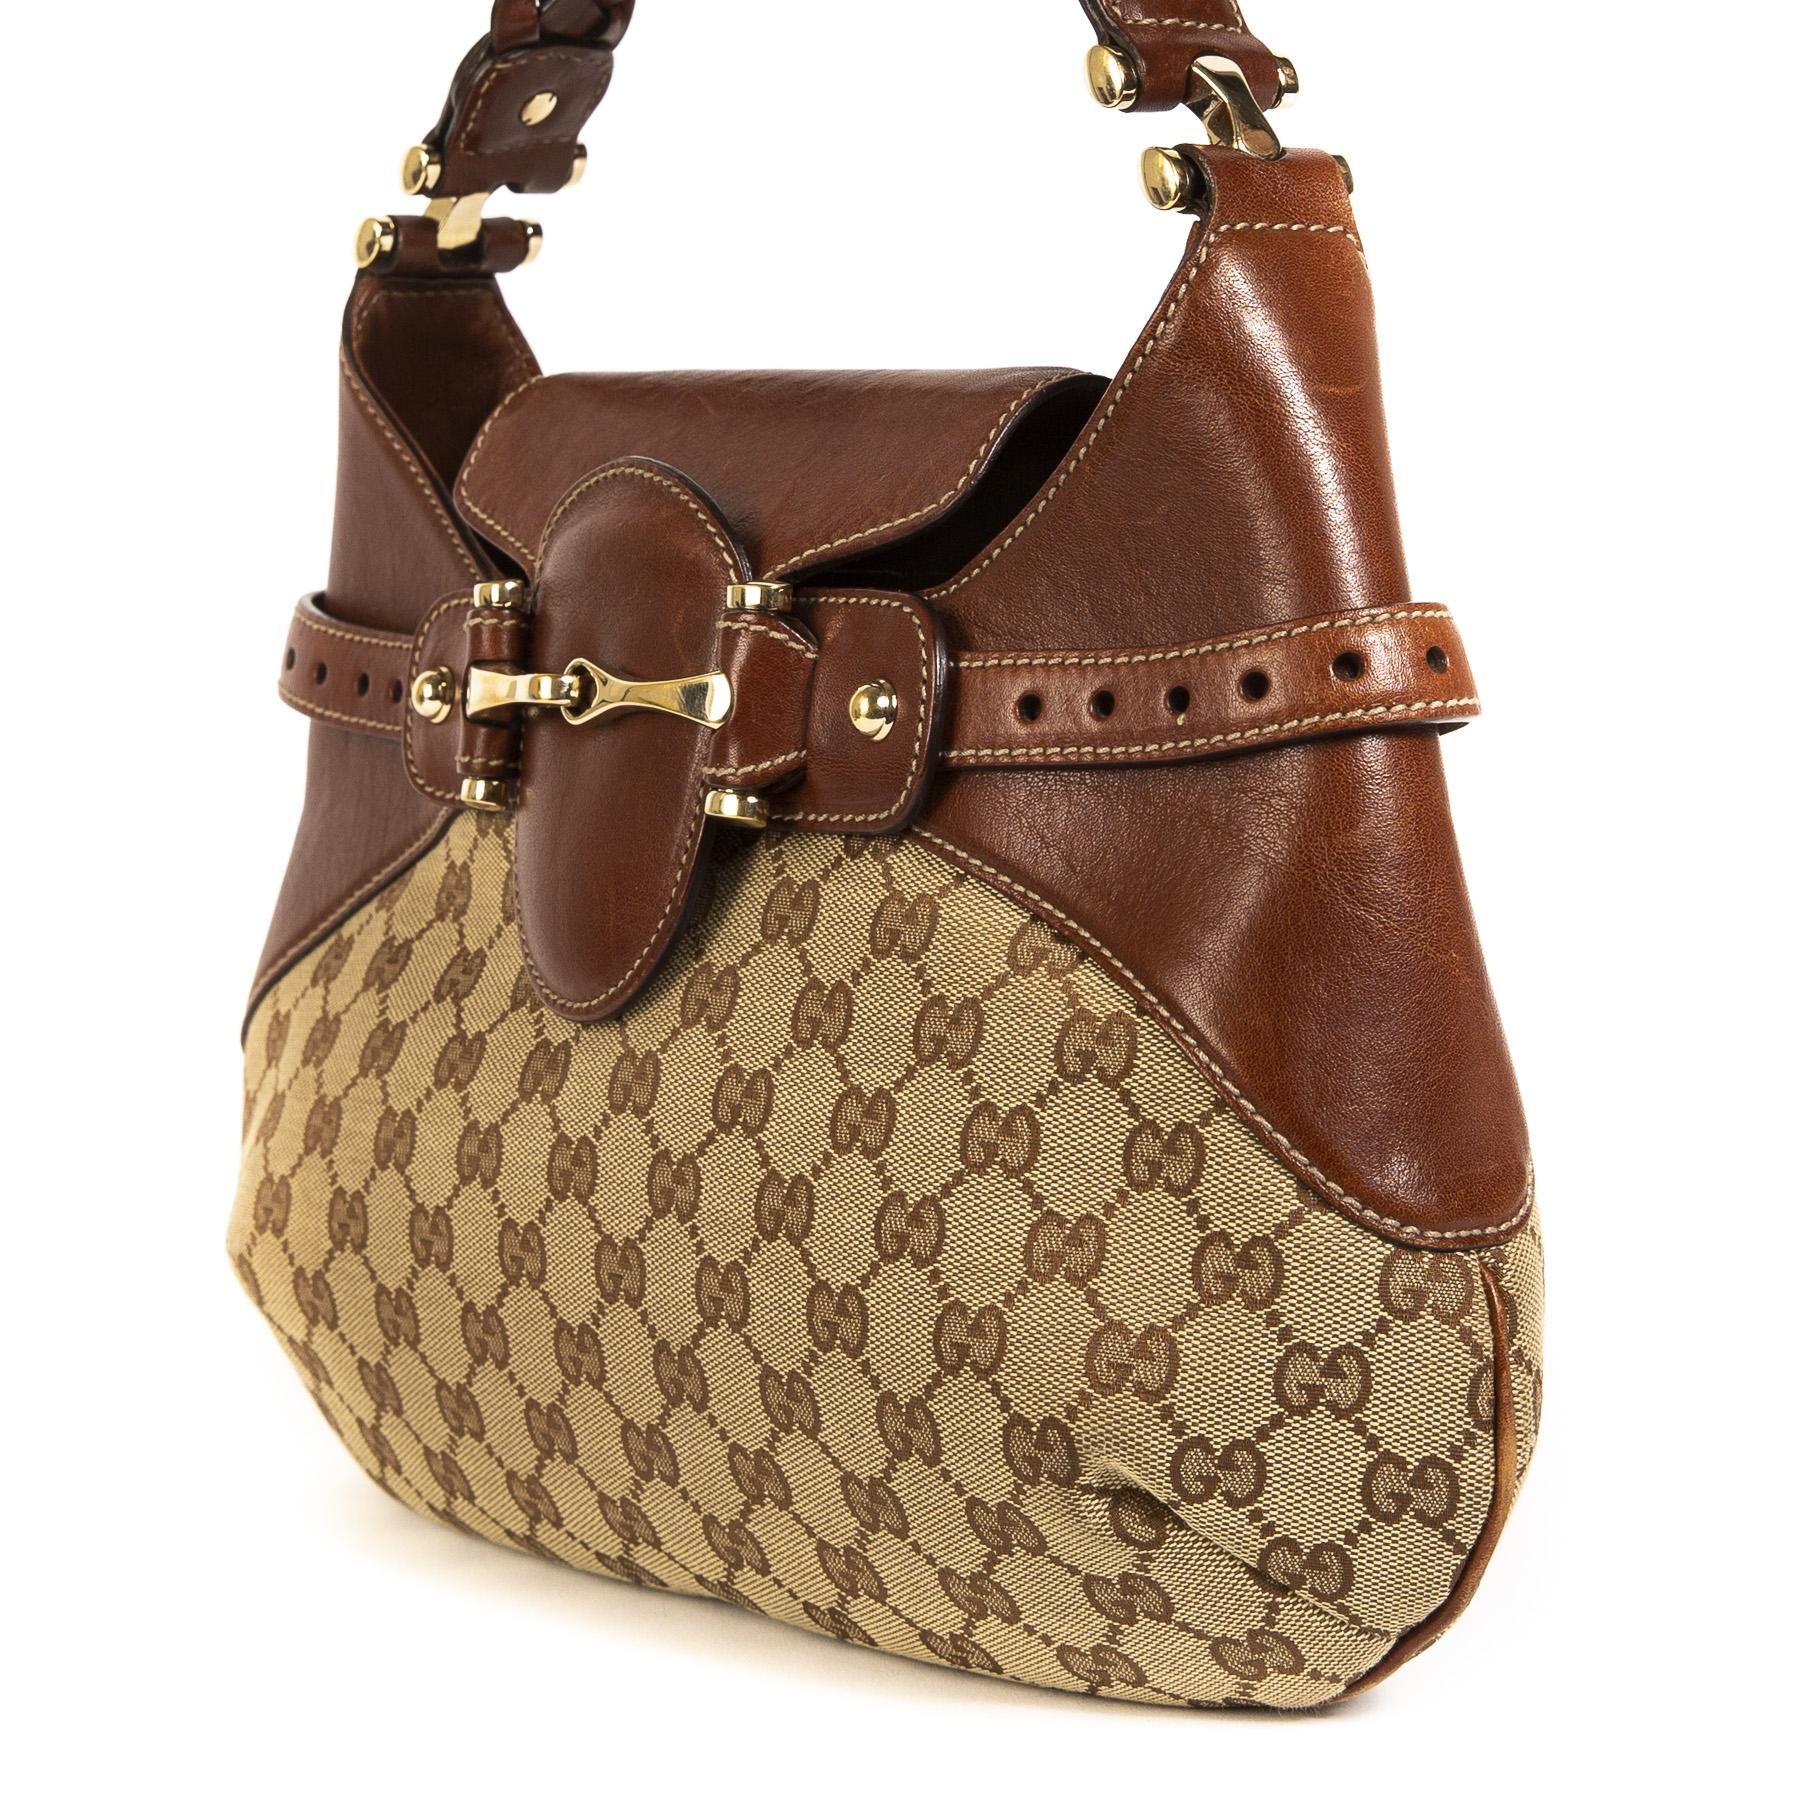 e796ac9f6930fe ... Delvaux Desert Brown Shoulder Bag veilig online tegen de beste prijs  Delvaux Desert Brown Shoulder Bag · Gucci